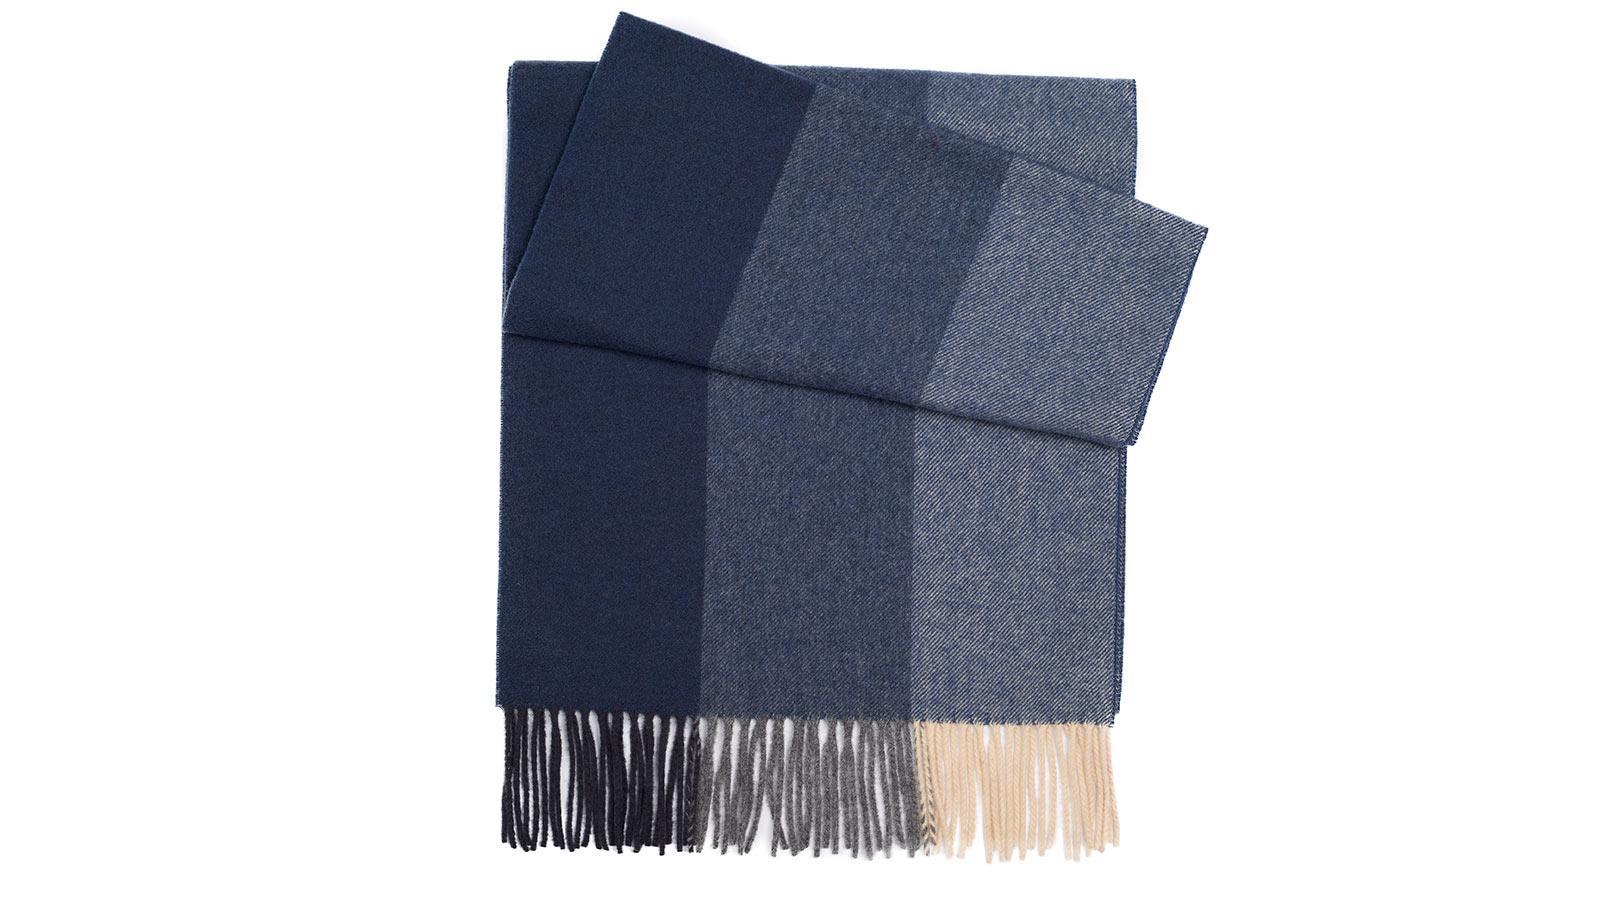 Navy & Blue Striped Wool Scarf - slider image 1